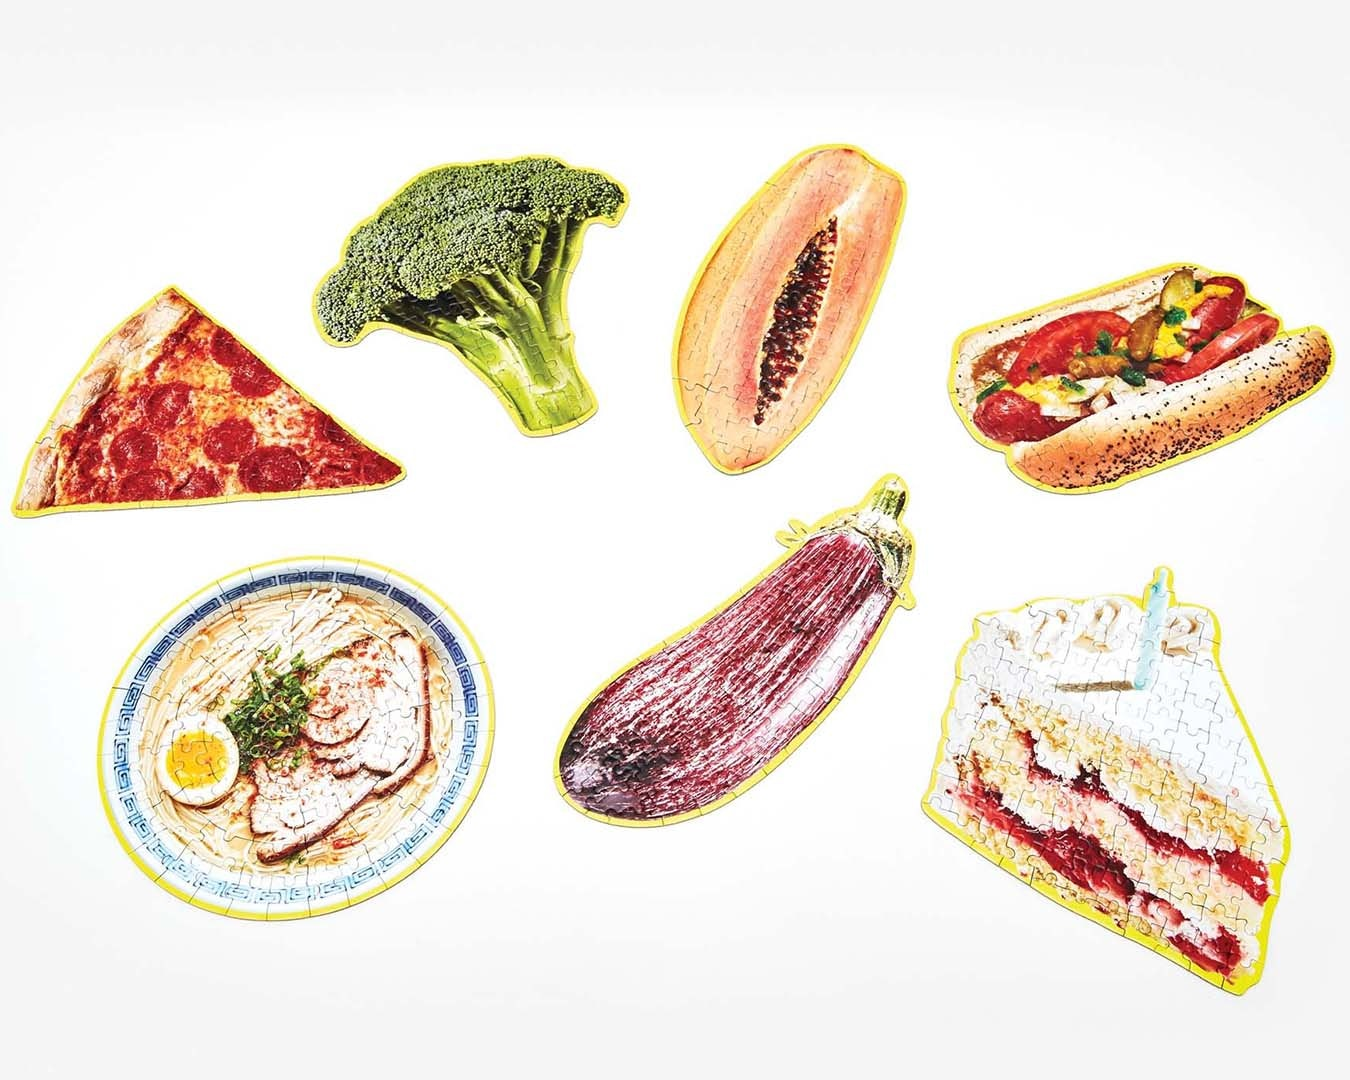 A selection of mini puzzles depicting a slice of pizza, hotdog, cake, ramen, melon, eggplant and broccoli.